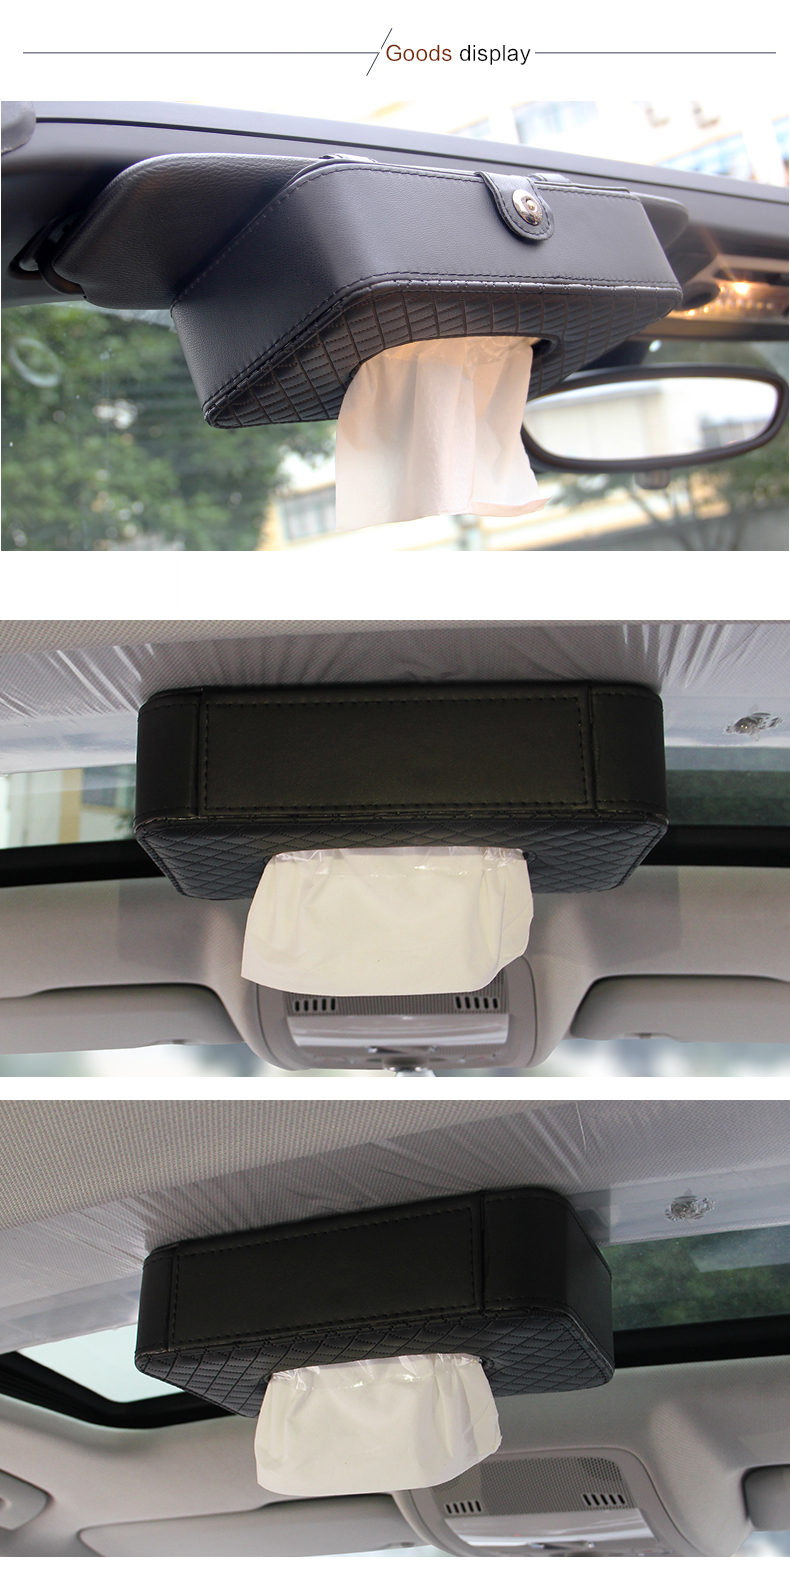 carro, recipiente, toalha, guardanapo, suporte para papel